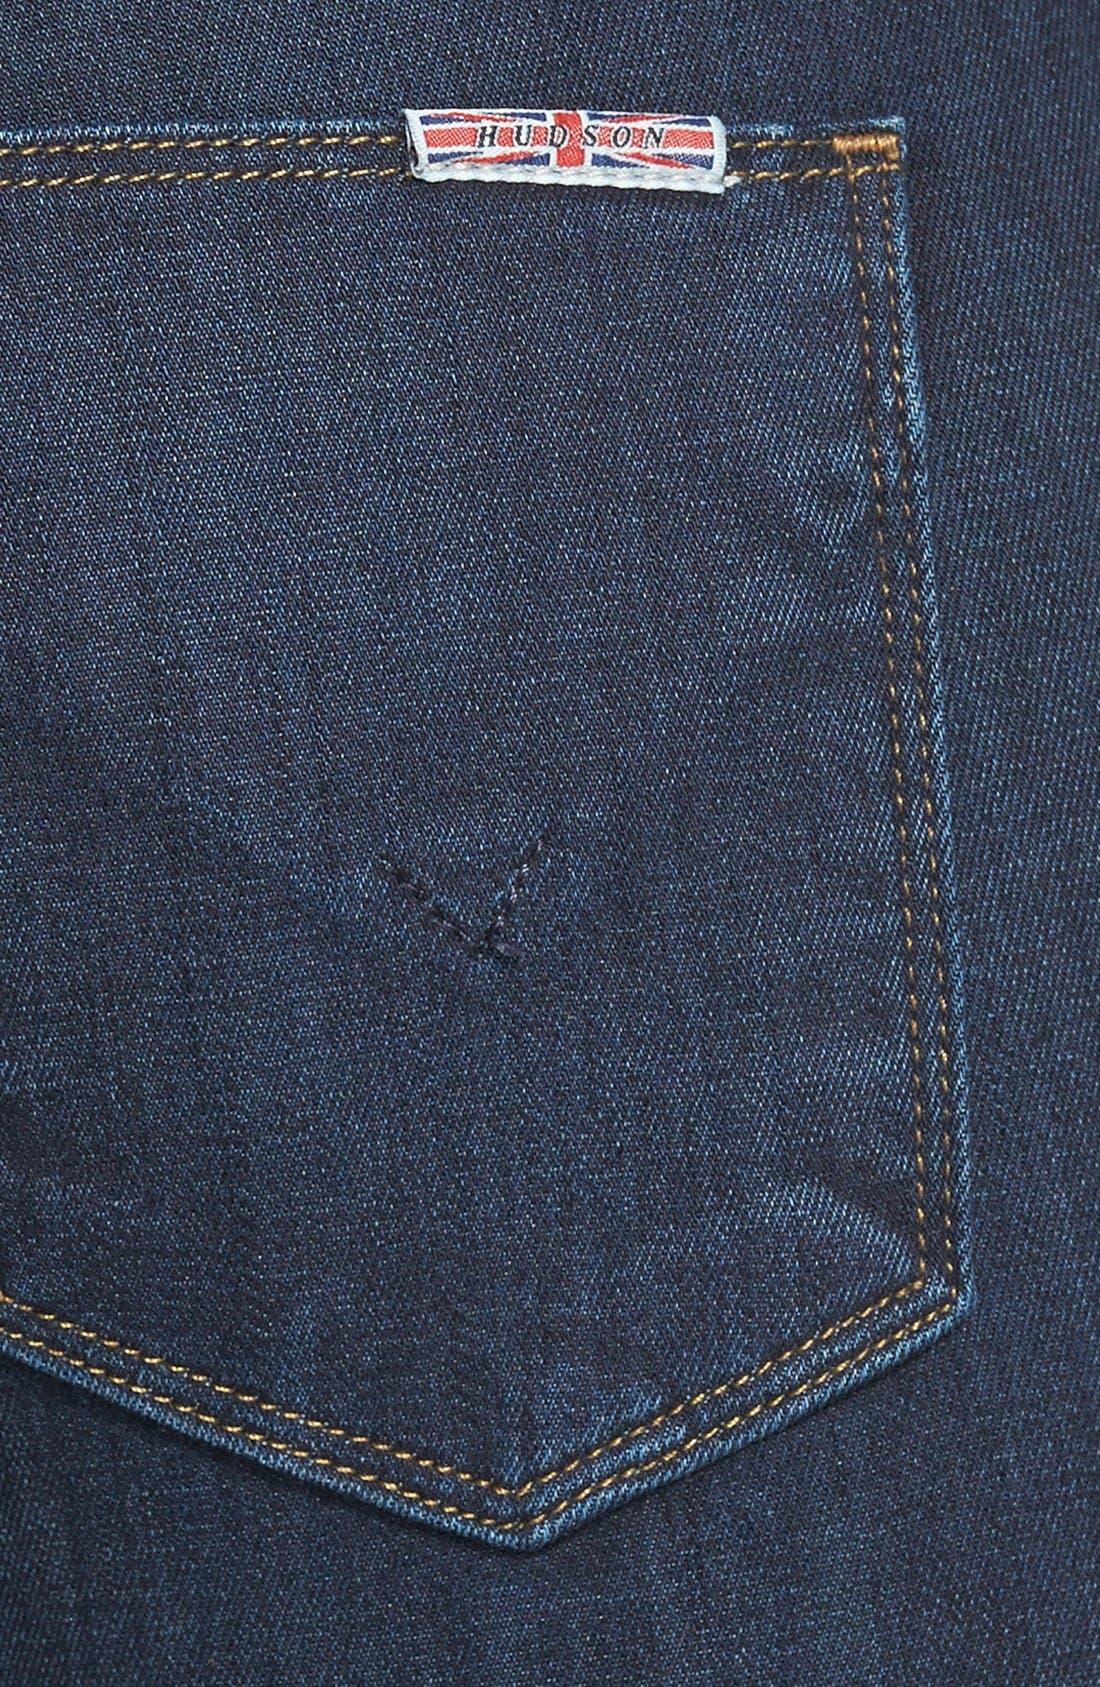 Alternate Image 3  - Hudson Jeans Mid Rise Skinny Jeans (Problem Child)